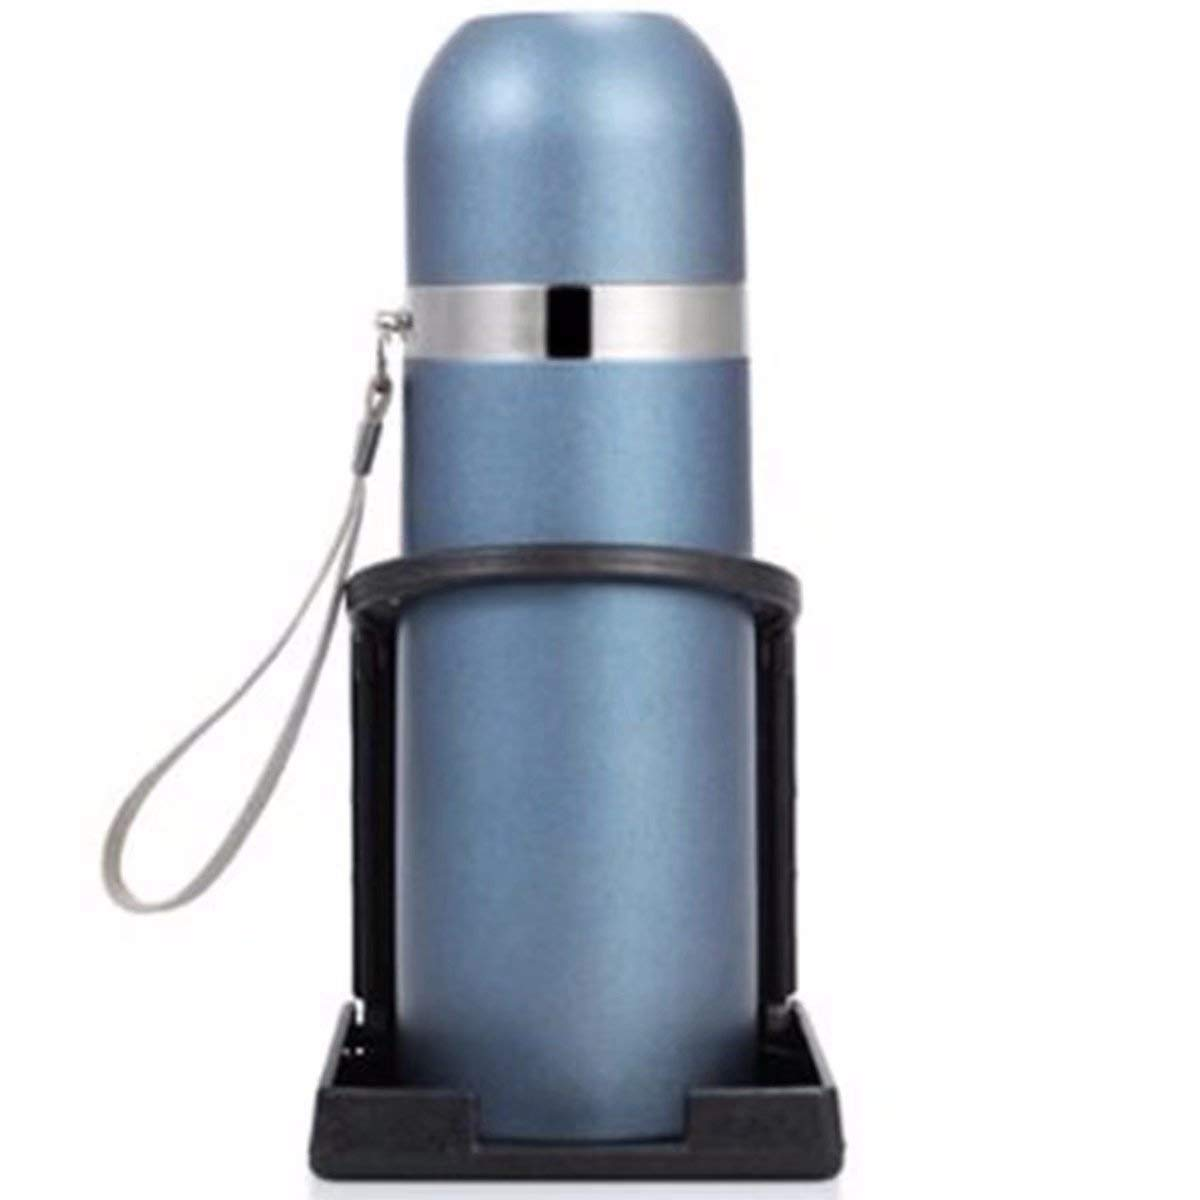 Linkstyle 2-Pack Universal Adjustable Folding Cup Drink Holder Car TRUCK BOAT VAN Home Plastic 99mm (Black)